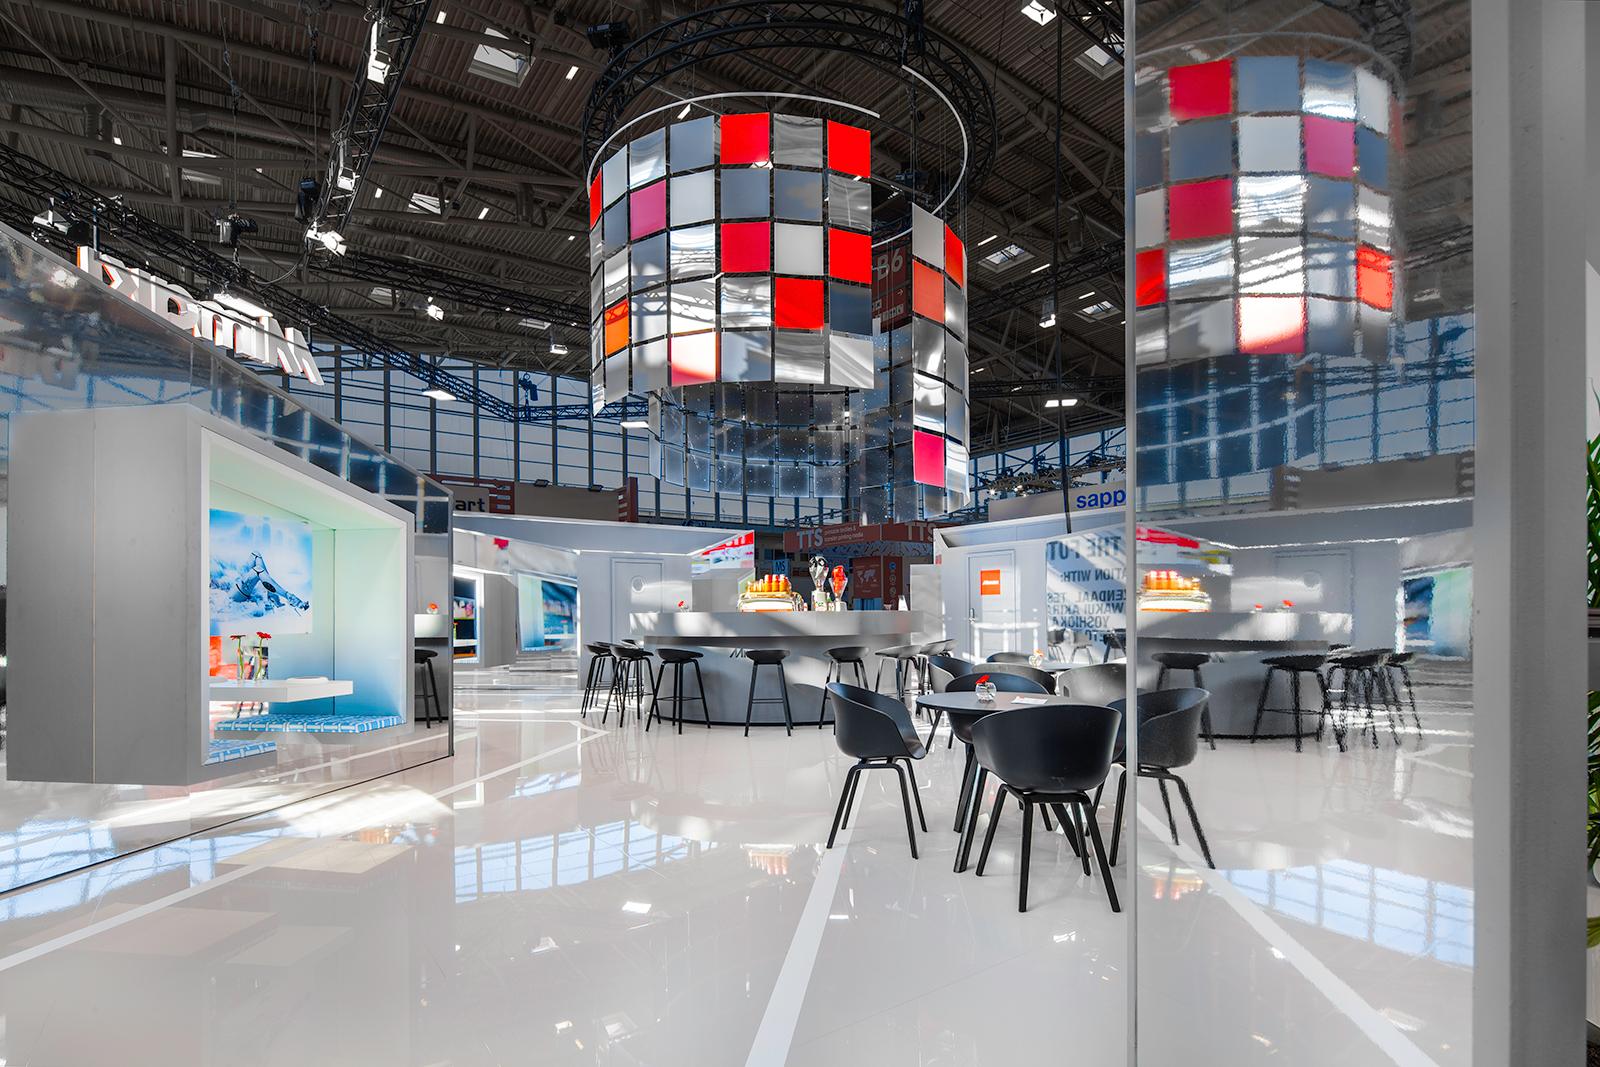 KOP Expo - Mimaki - Fespa 2019 - München - Stand Photography #2615(lr)